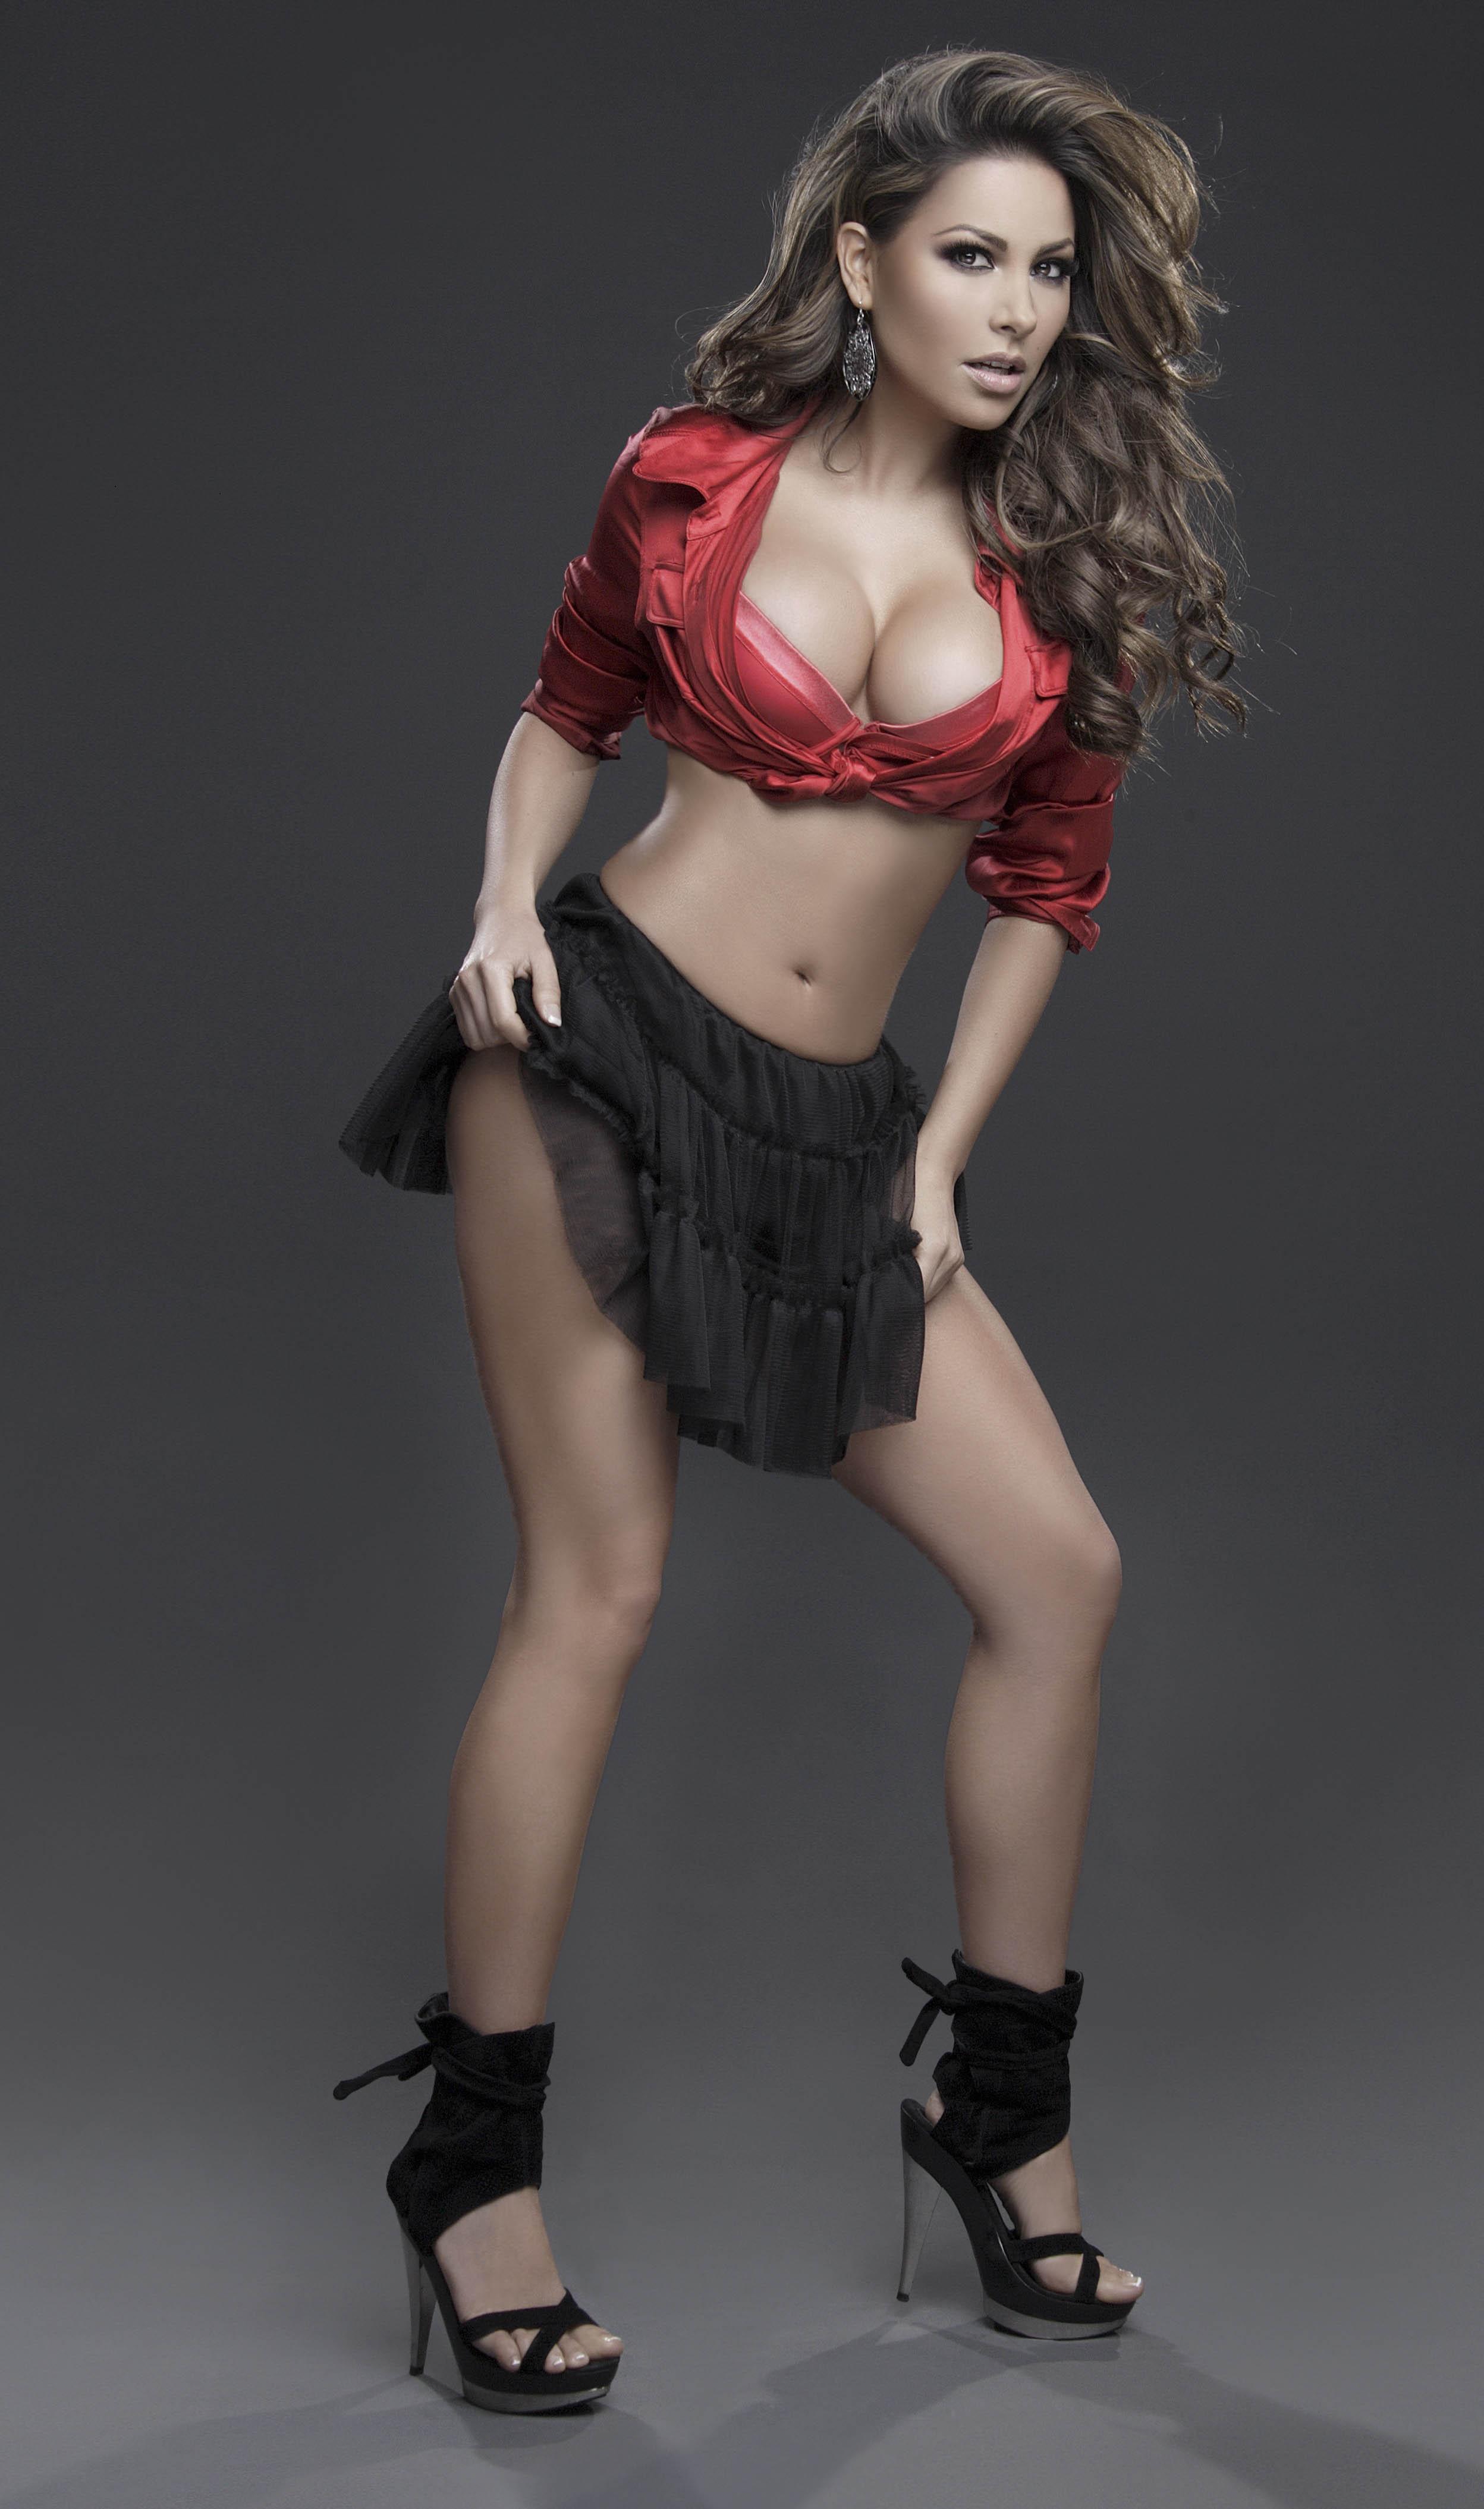 Сексуальные мексиканские девушки 5 ...